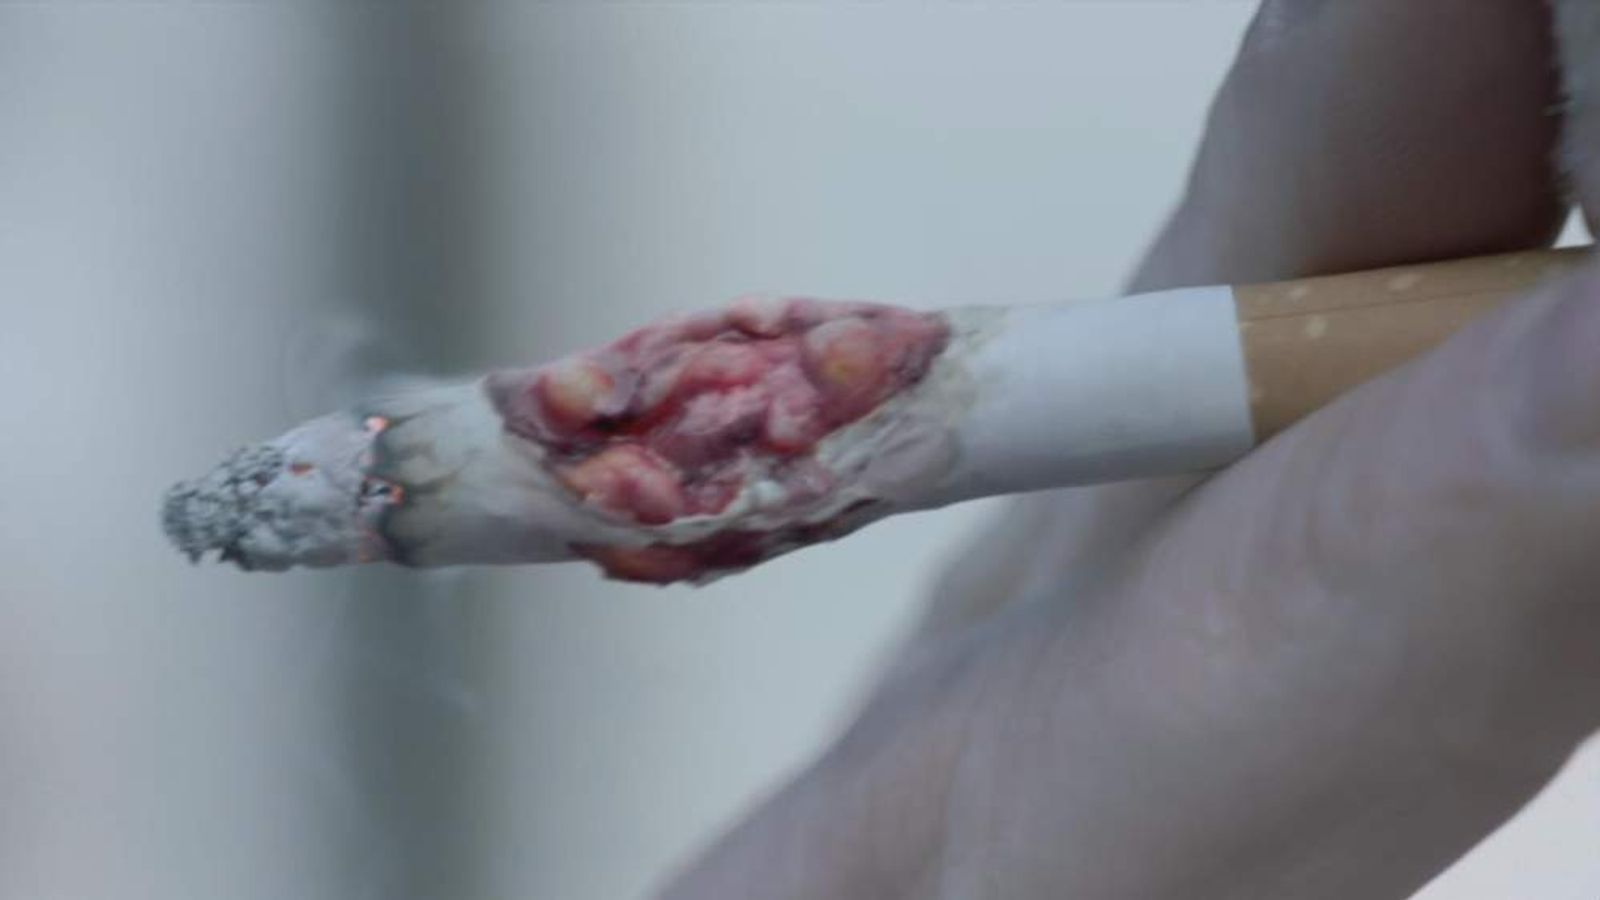 Anti-Smoking Advert Shows Cigarette Tumour